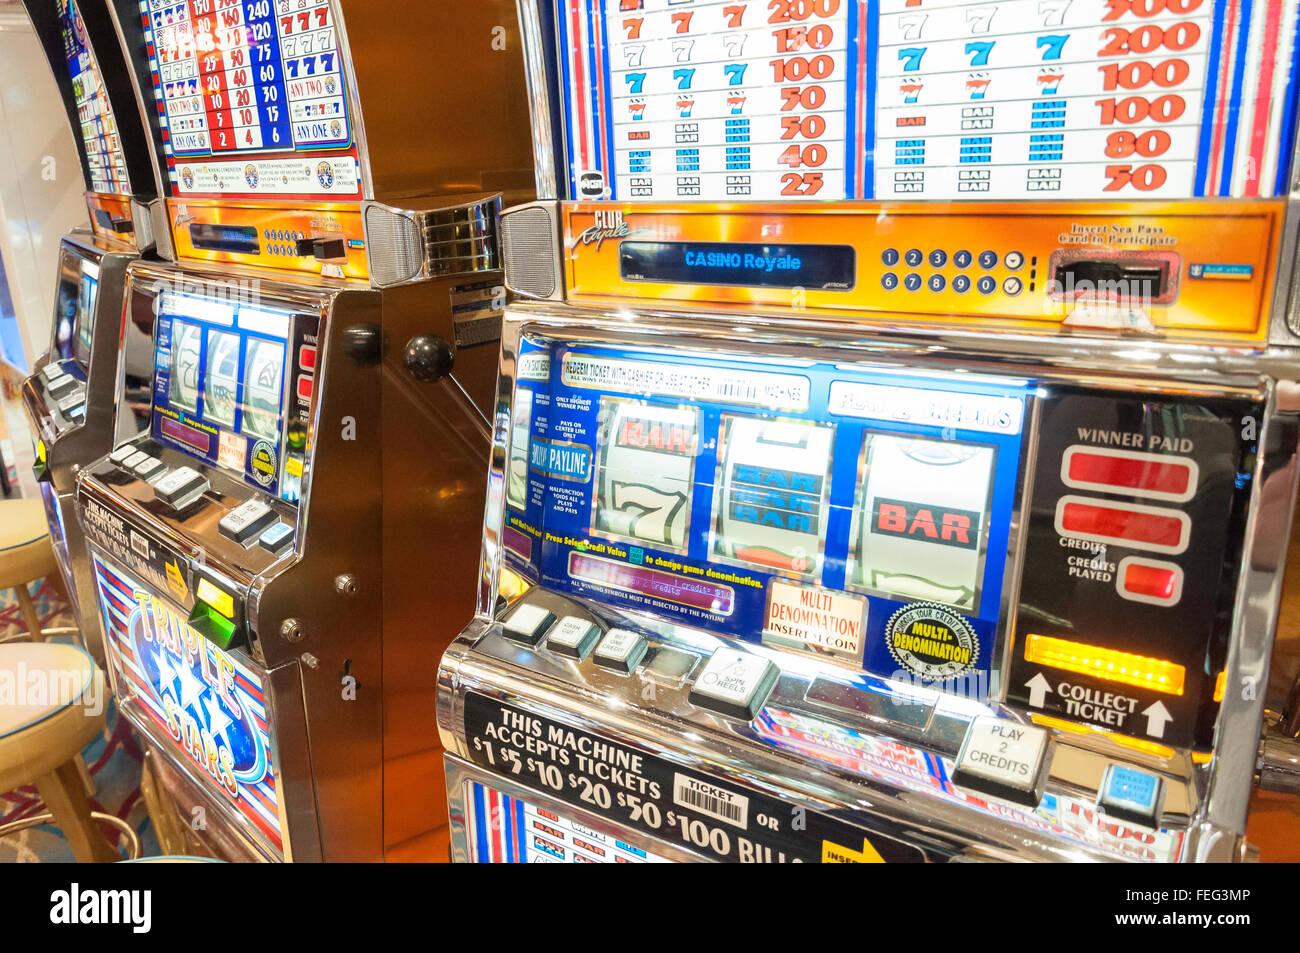 Slot machines in casino on board Royal Caribbean 'Brilliance of the Seas' cruise ship, Mediterranean, Europe Stock Photo